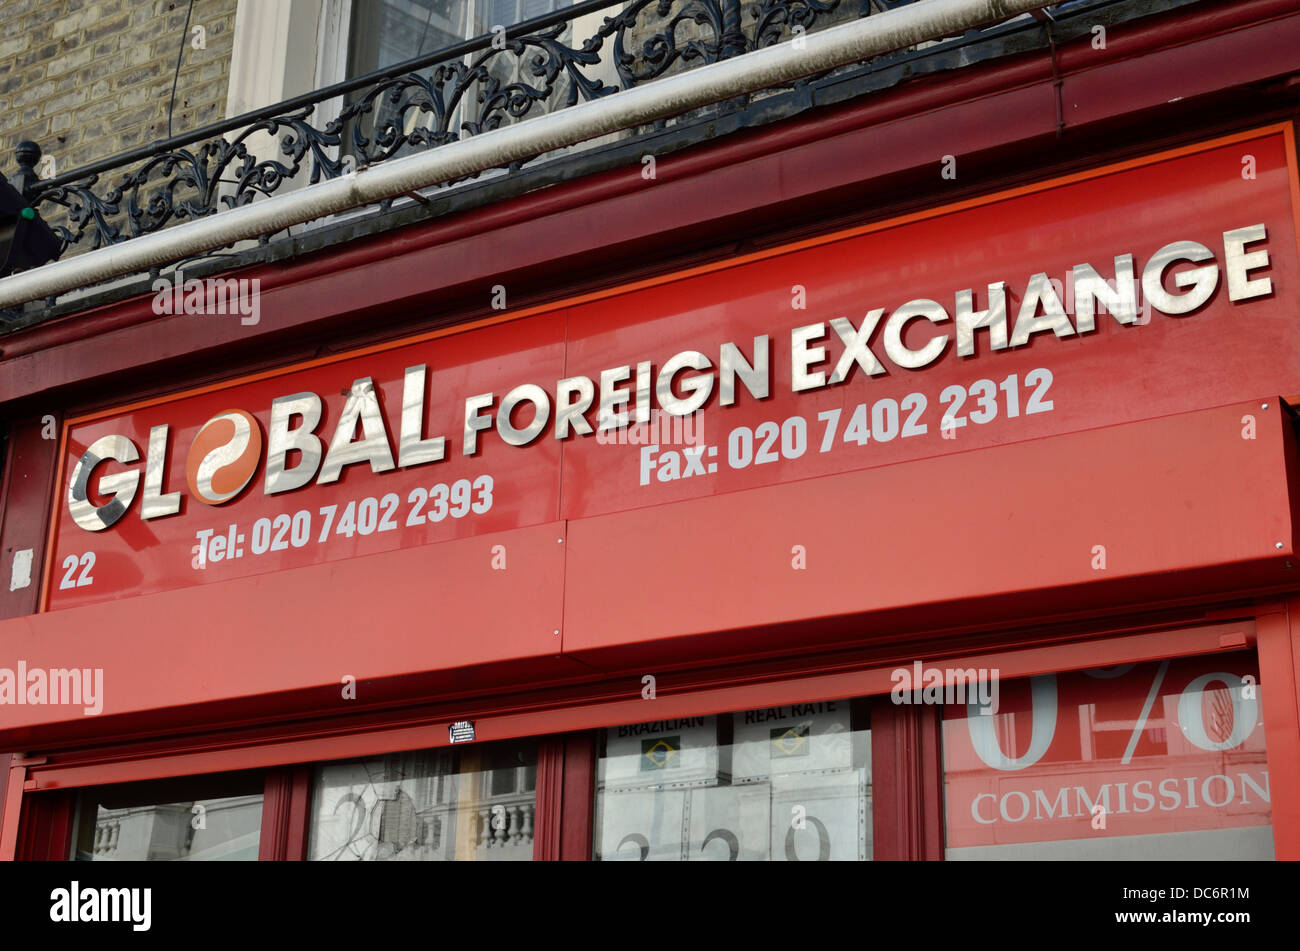 Global Foreign Exchange sign, London, UK - Stock Image